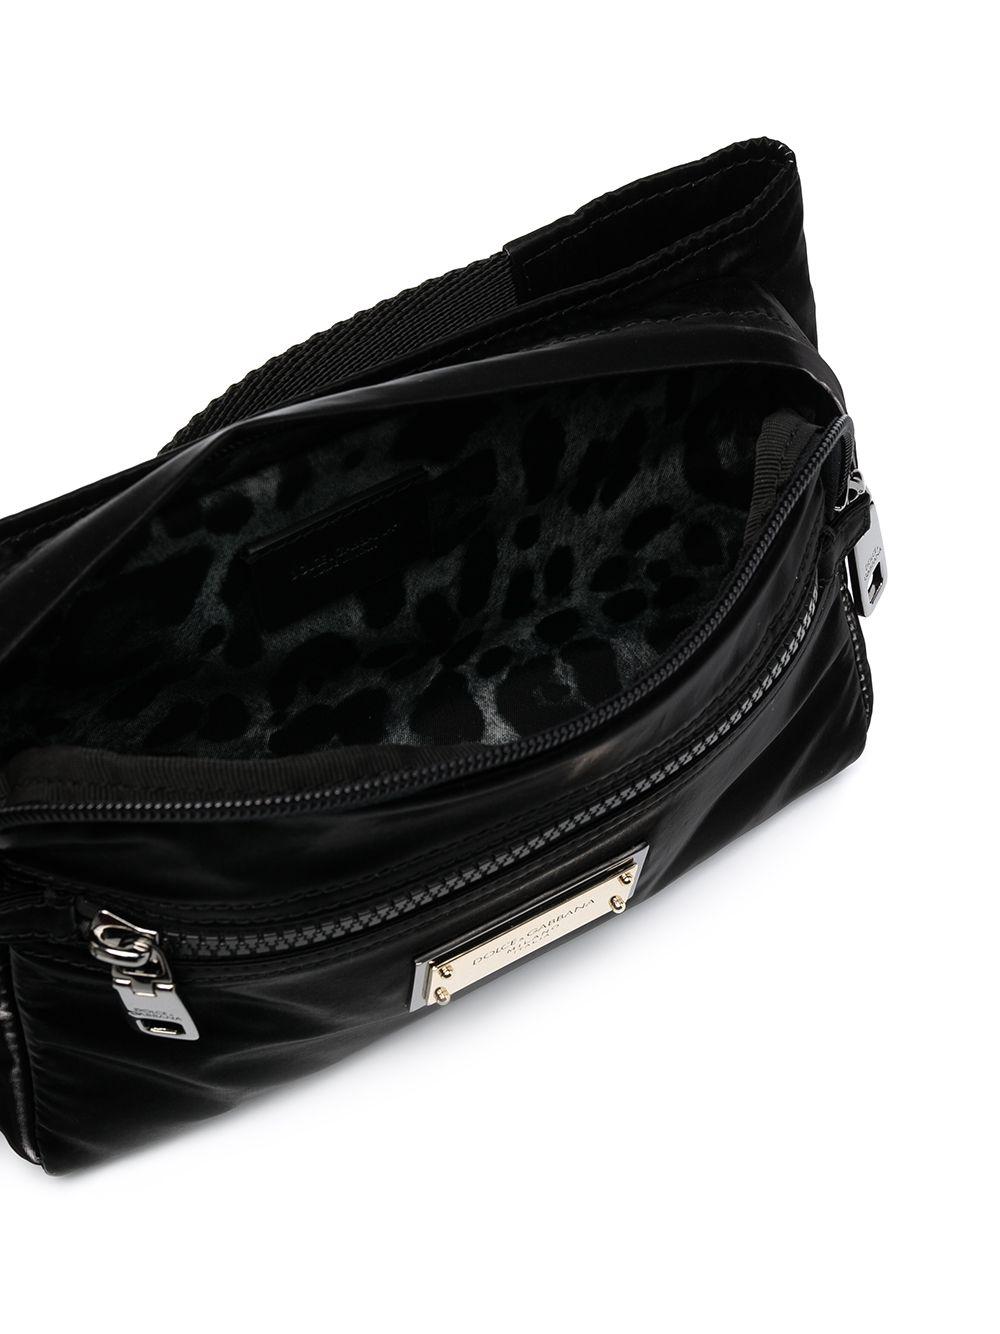 Picture of Dolce & Gabbana   Belt Bag